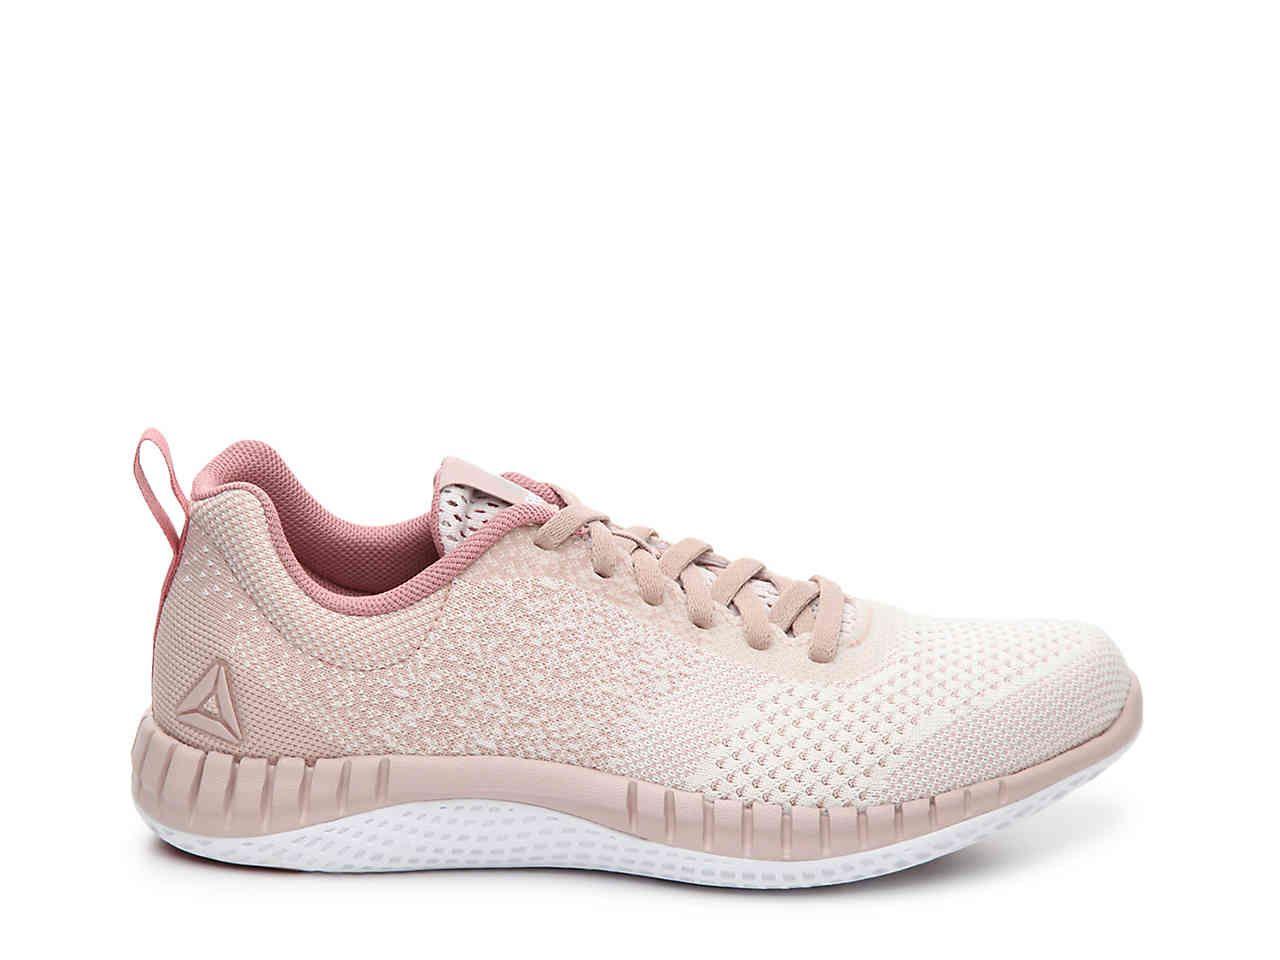 Artù lotto da ora in poi  Reebok ZPrint Run Prime Lightweight Running Shoe - Women's Women's Shoes |  DSW